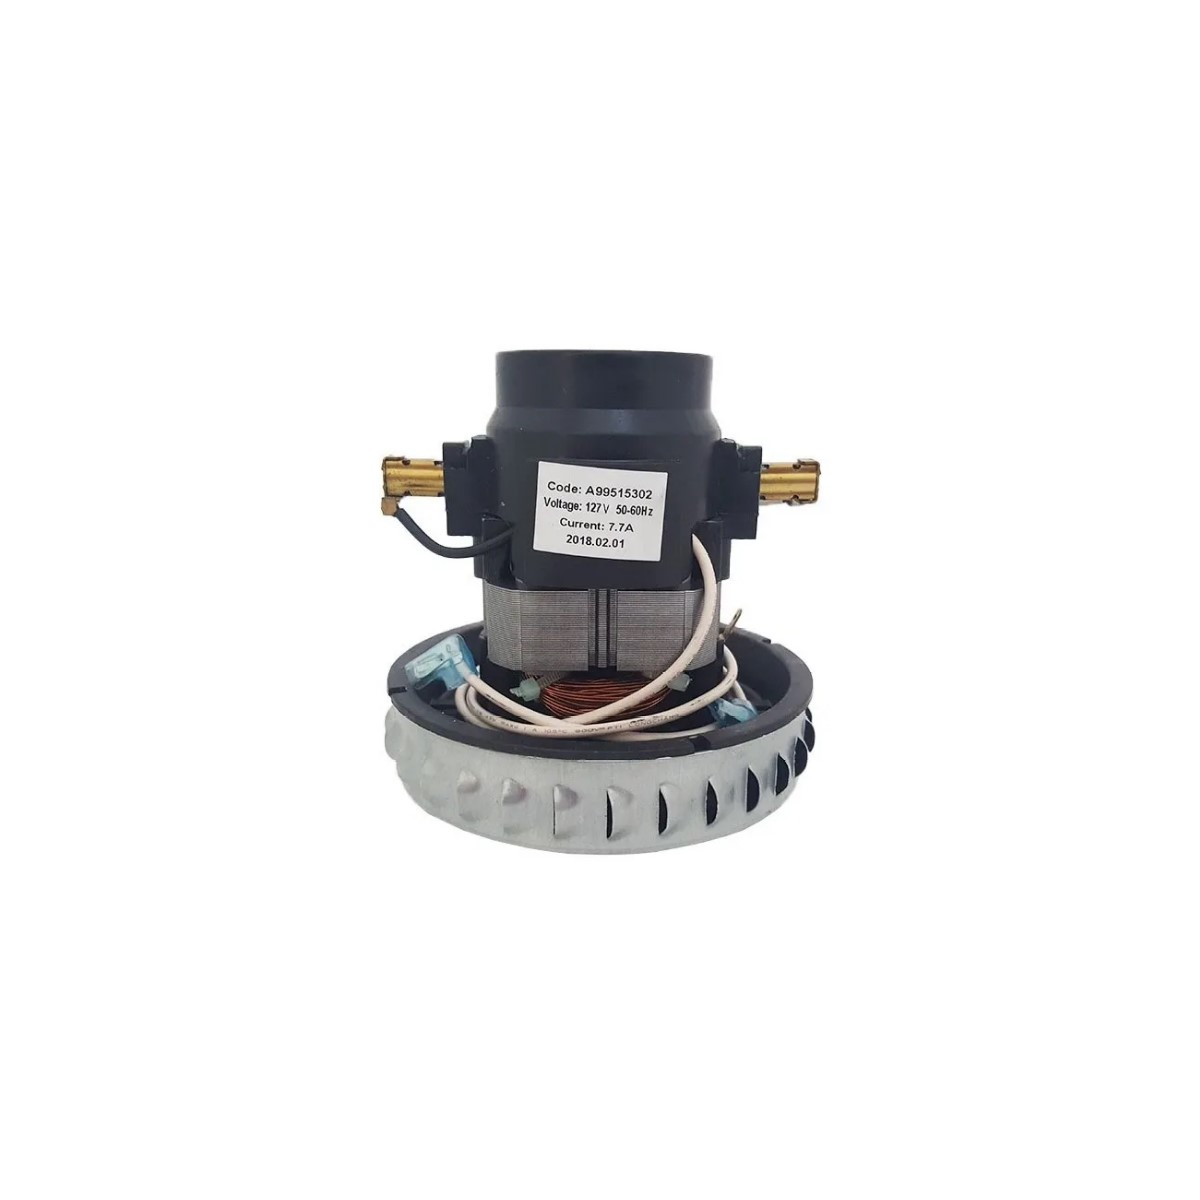 Motor Aspirador Electrolux Gtn30 A99515302 ORIGINAL